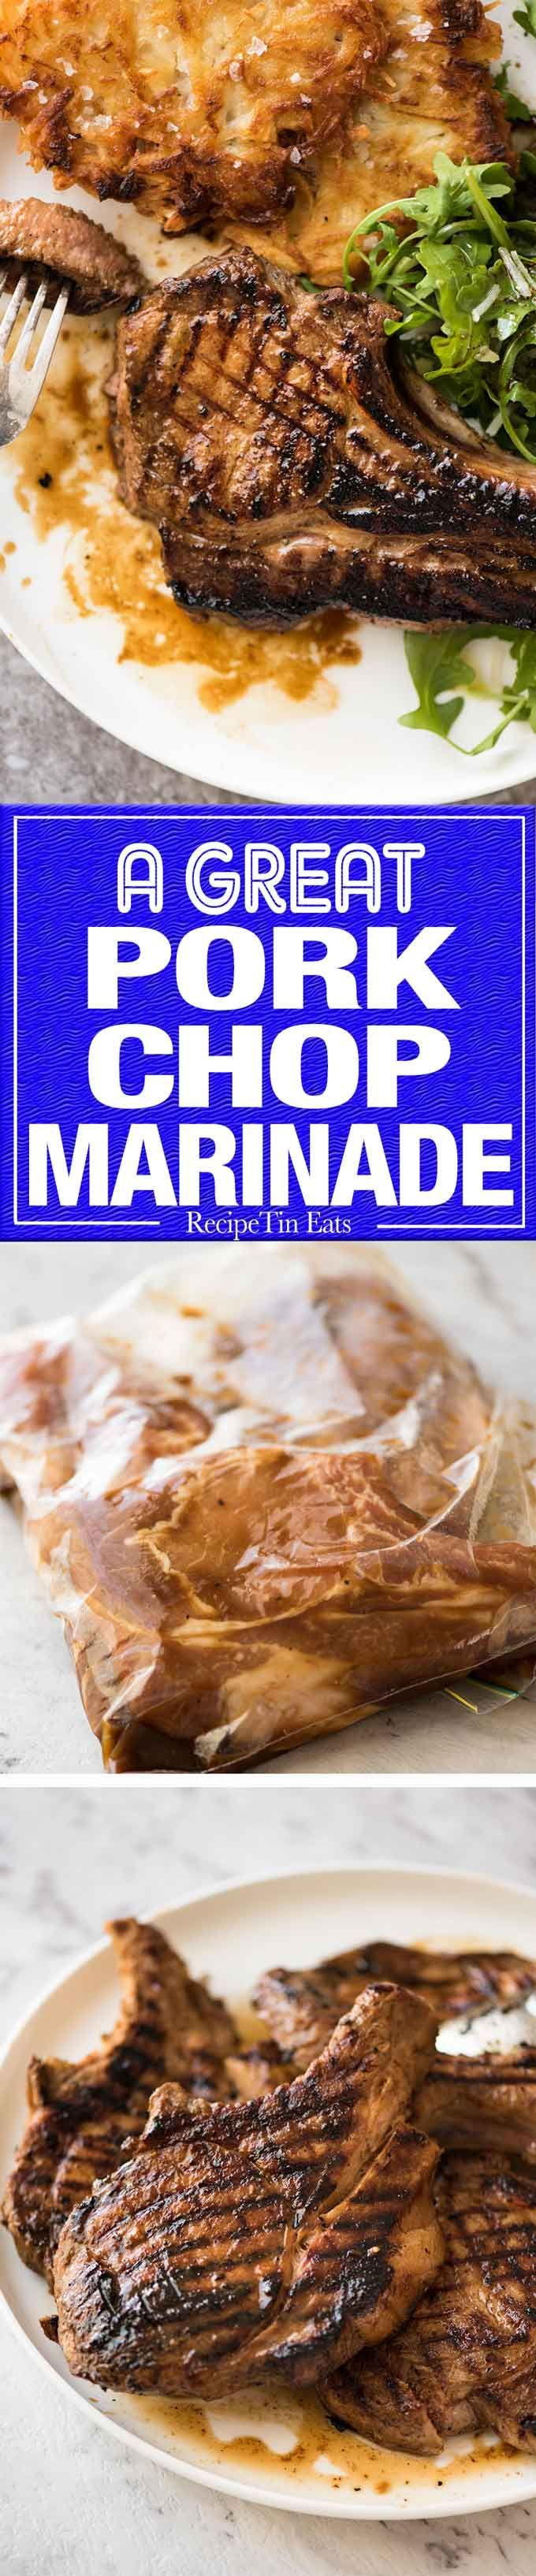 Pork Chop Marinade